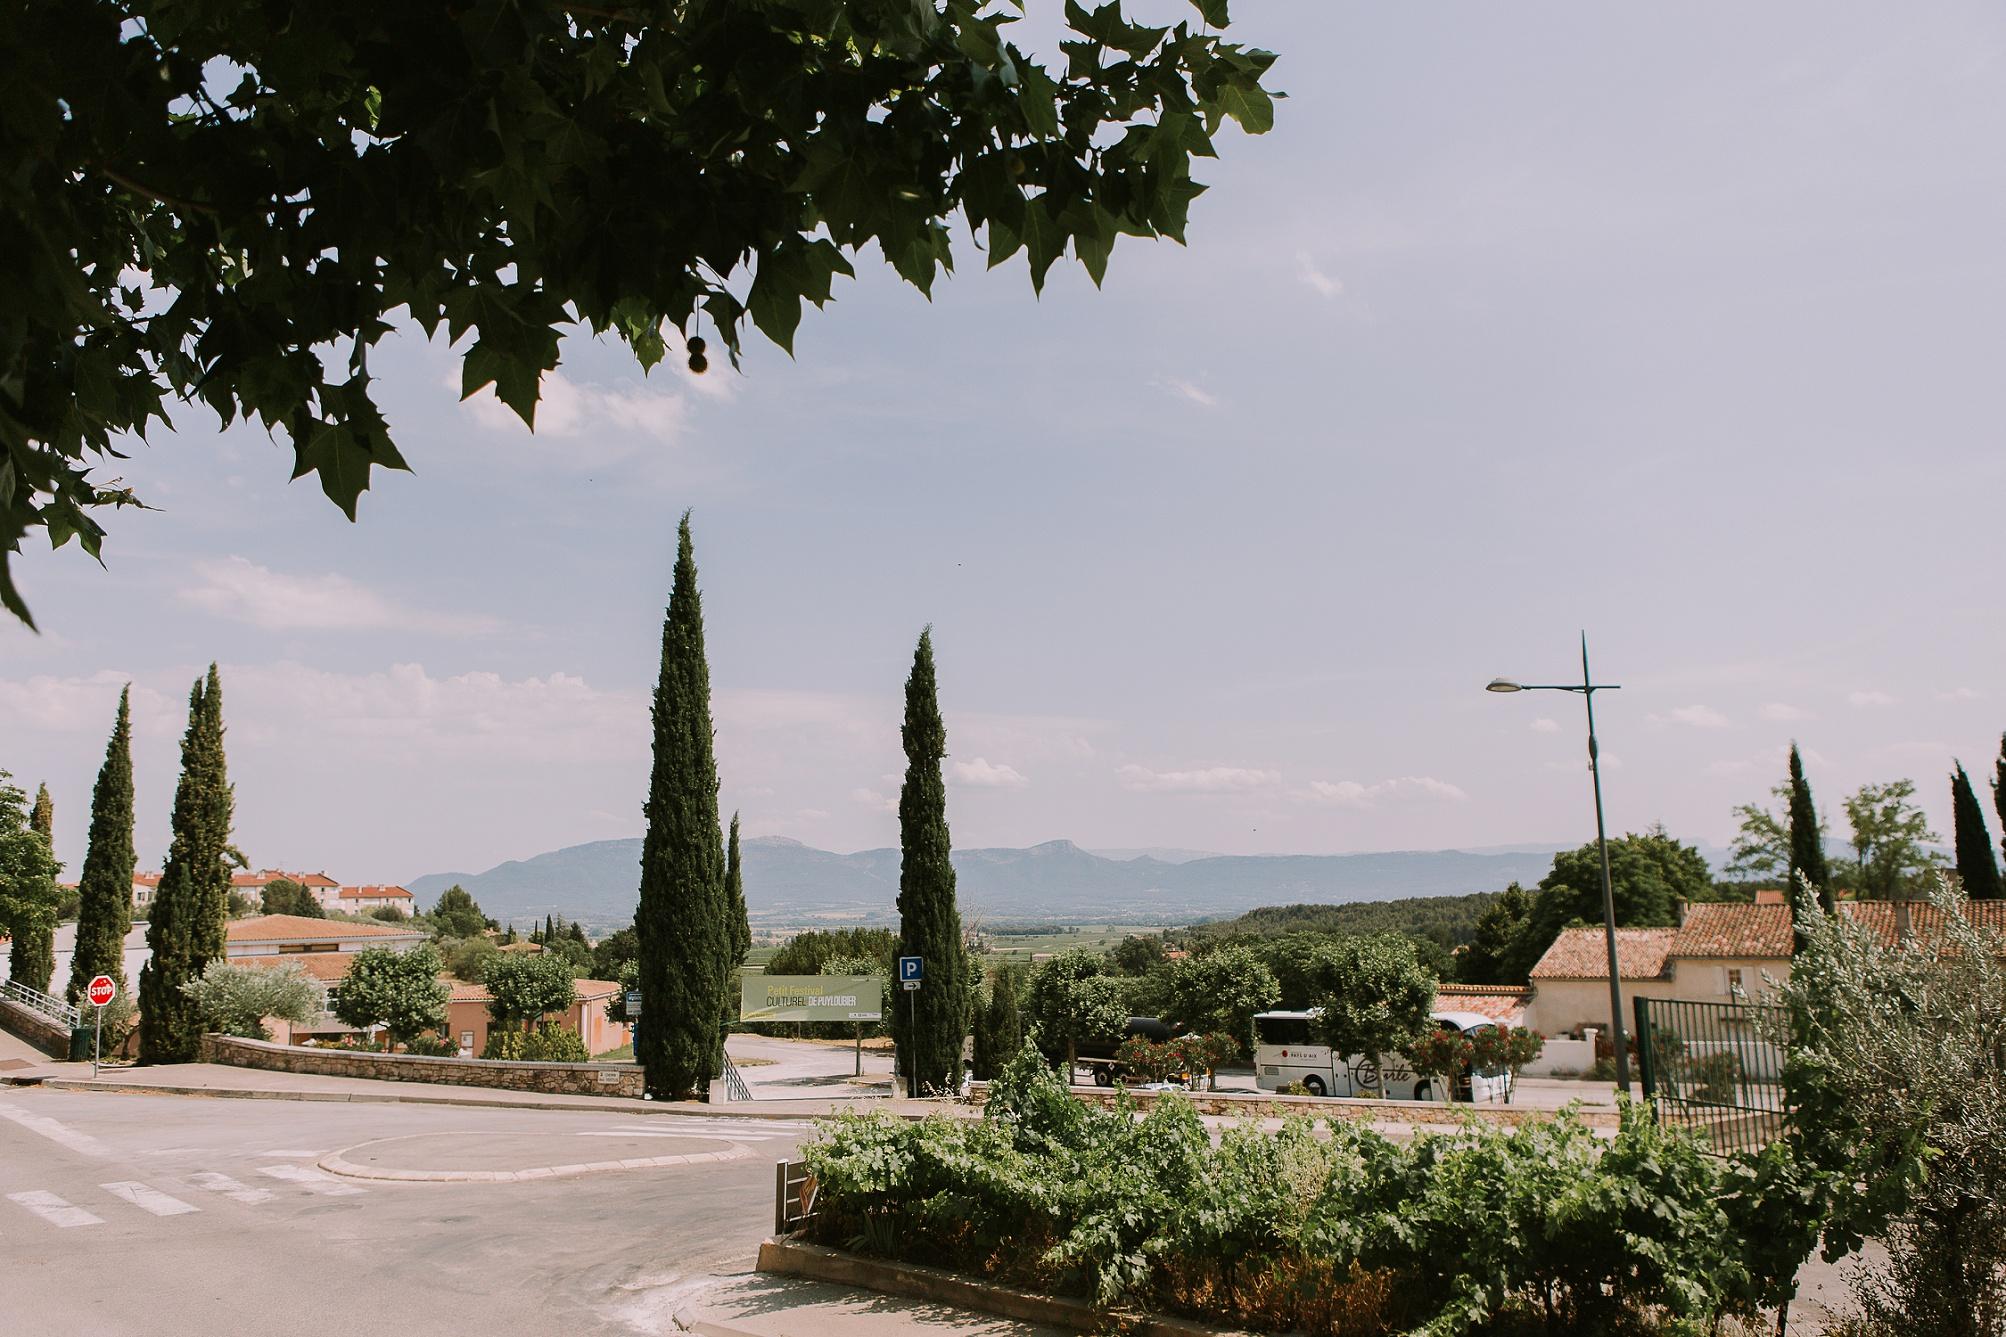 katerynaphotos-mariage-photographe-puyloubier-provence-aix-en-provence-sud-de-la-france_0352.jpg